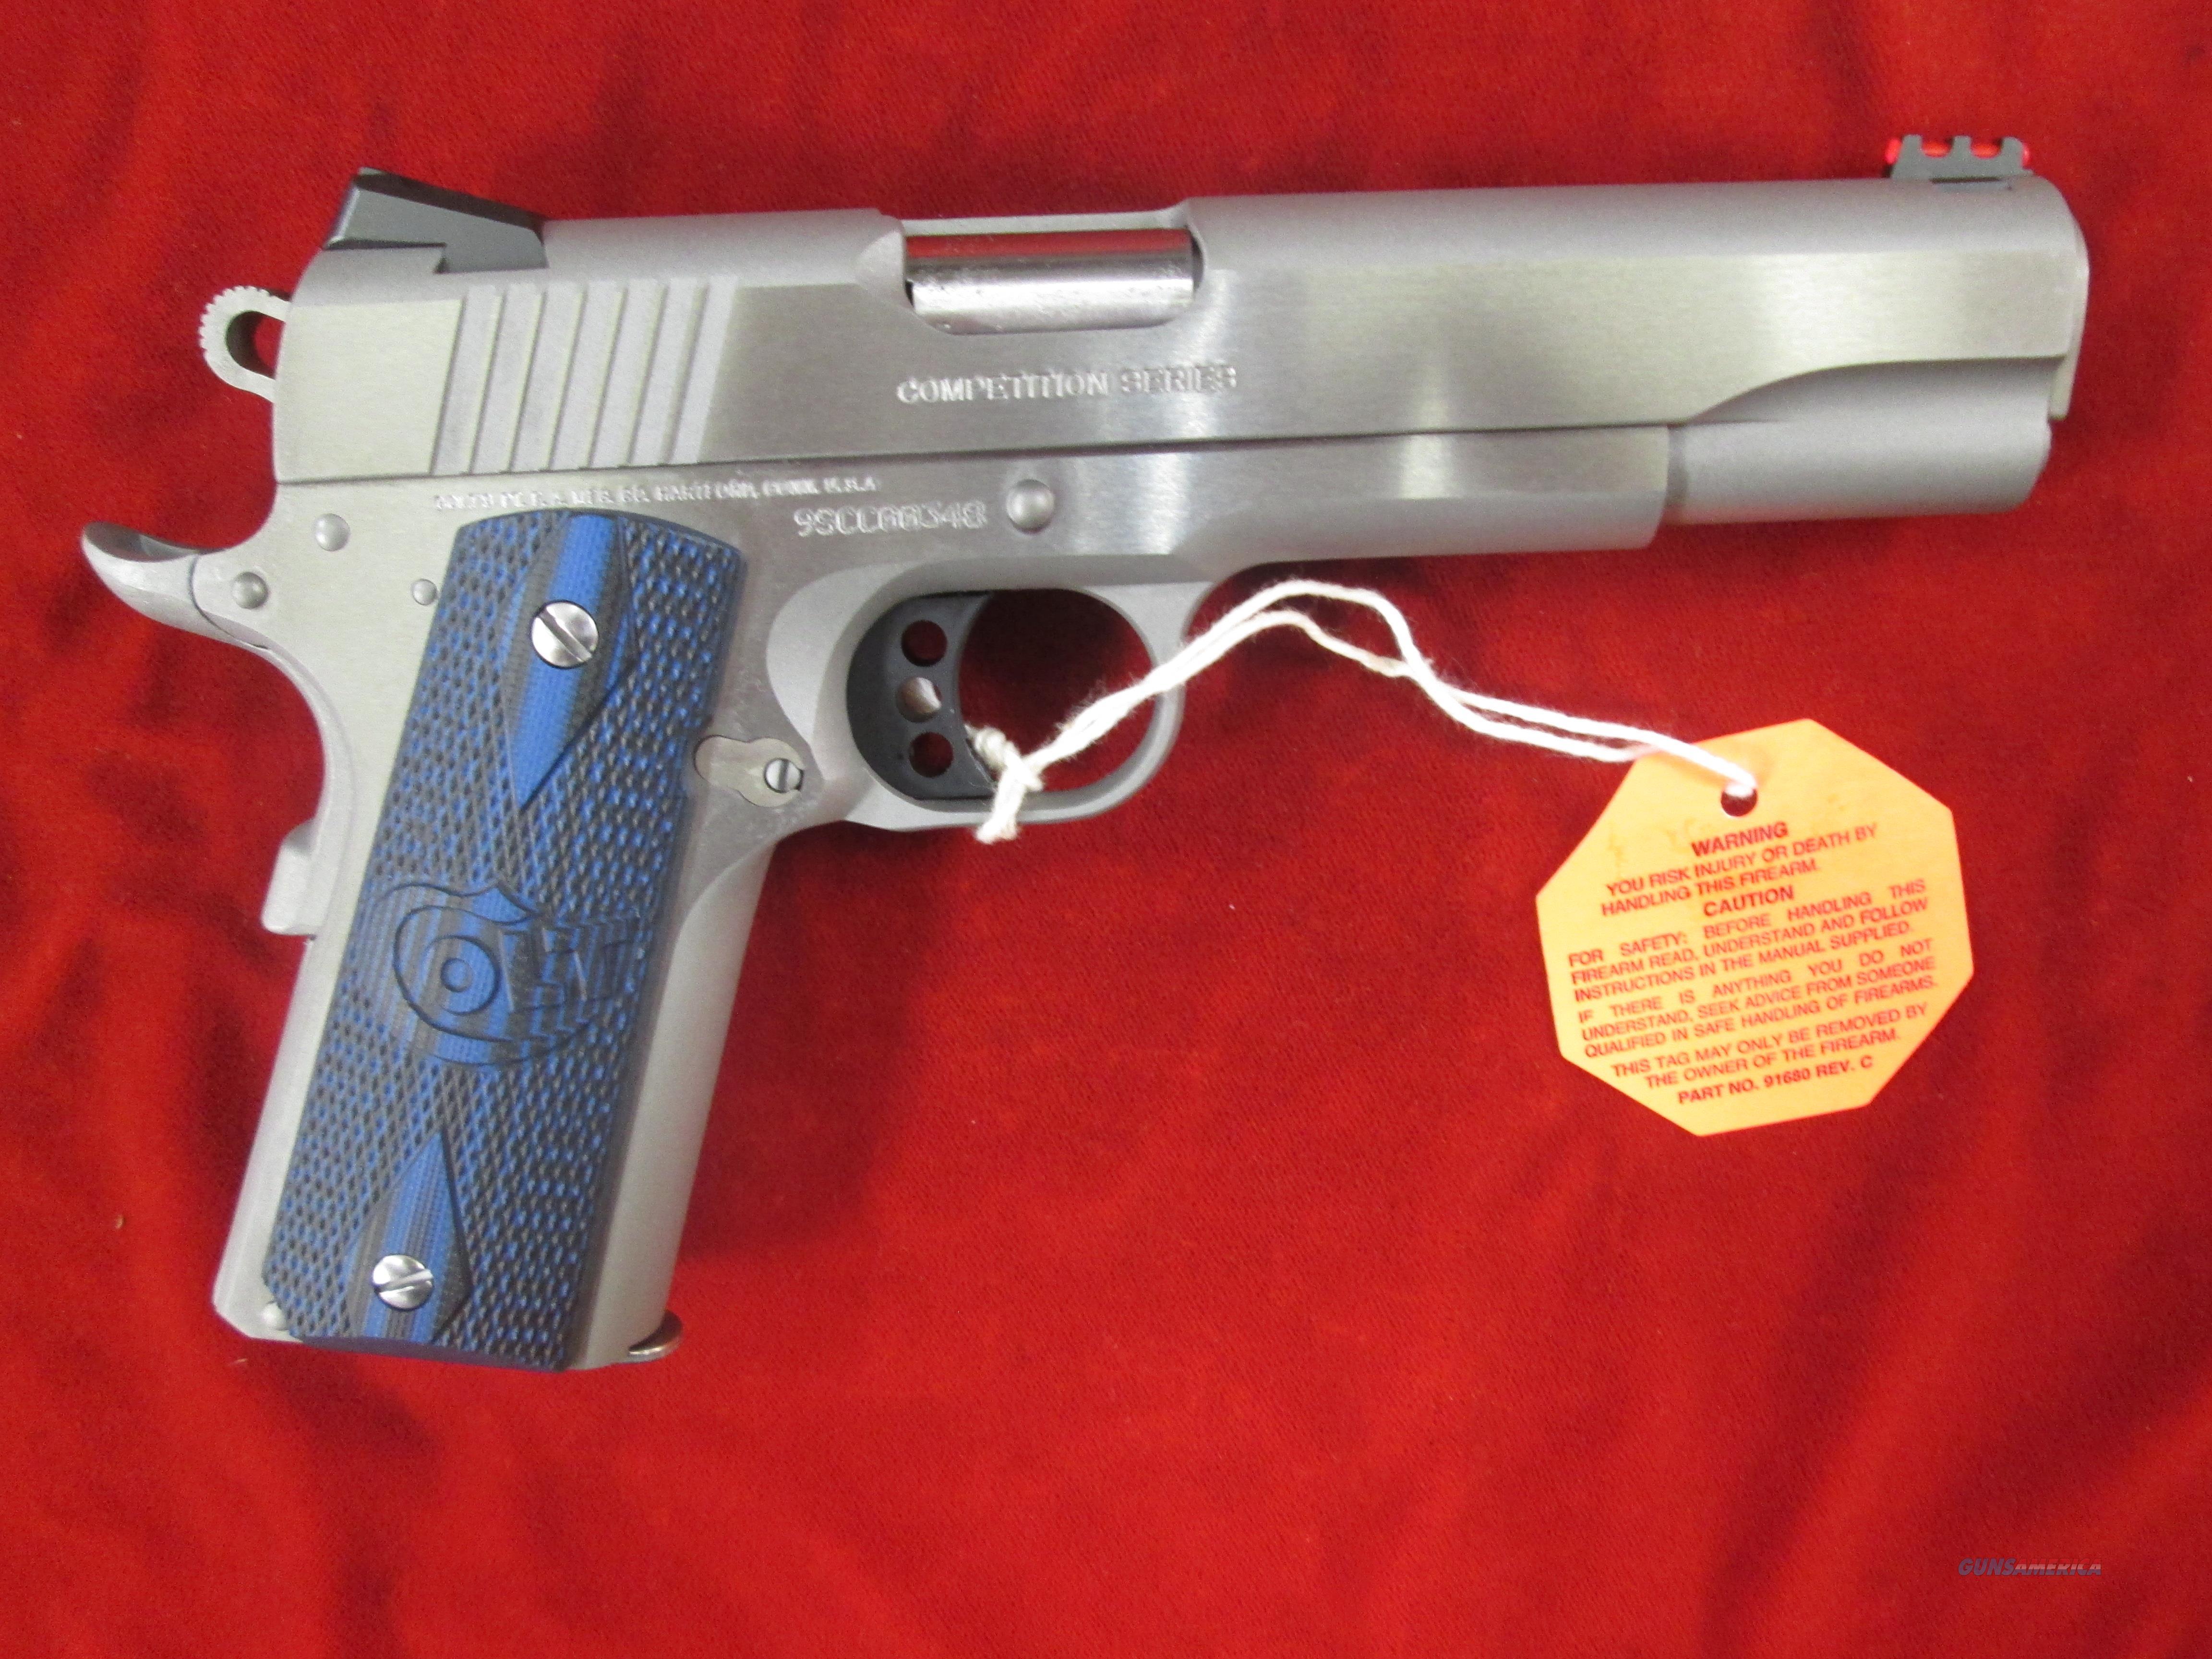 COLT COMPETITION PISTOL GOVERNMENT MODEL STAINLESS 9MM NEW (01082CCS)   Guns > Pistols > Colt Automatic Pistols (1911 & Var)